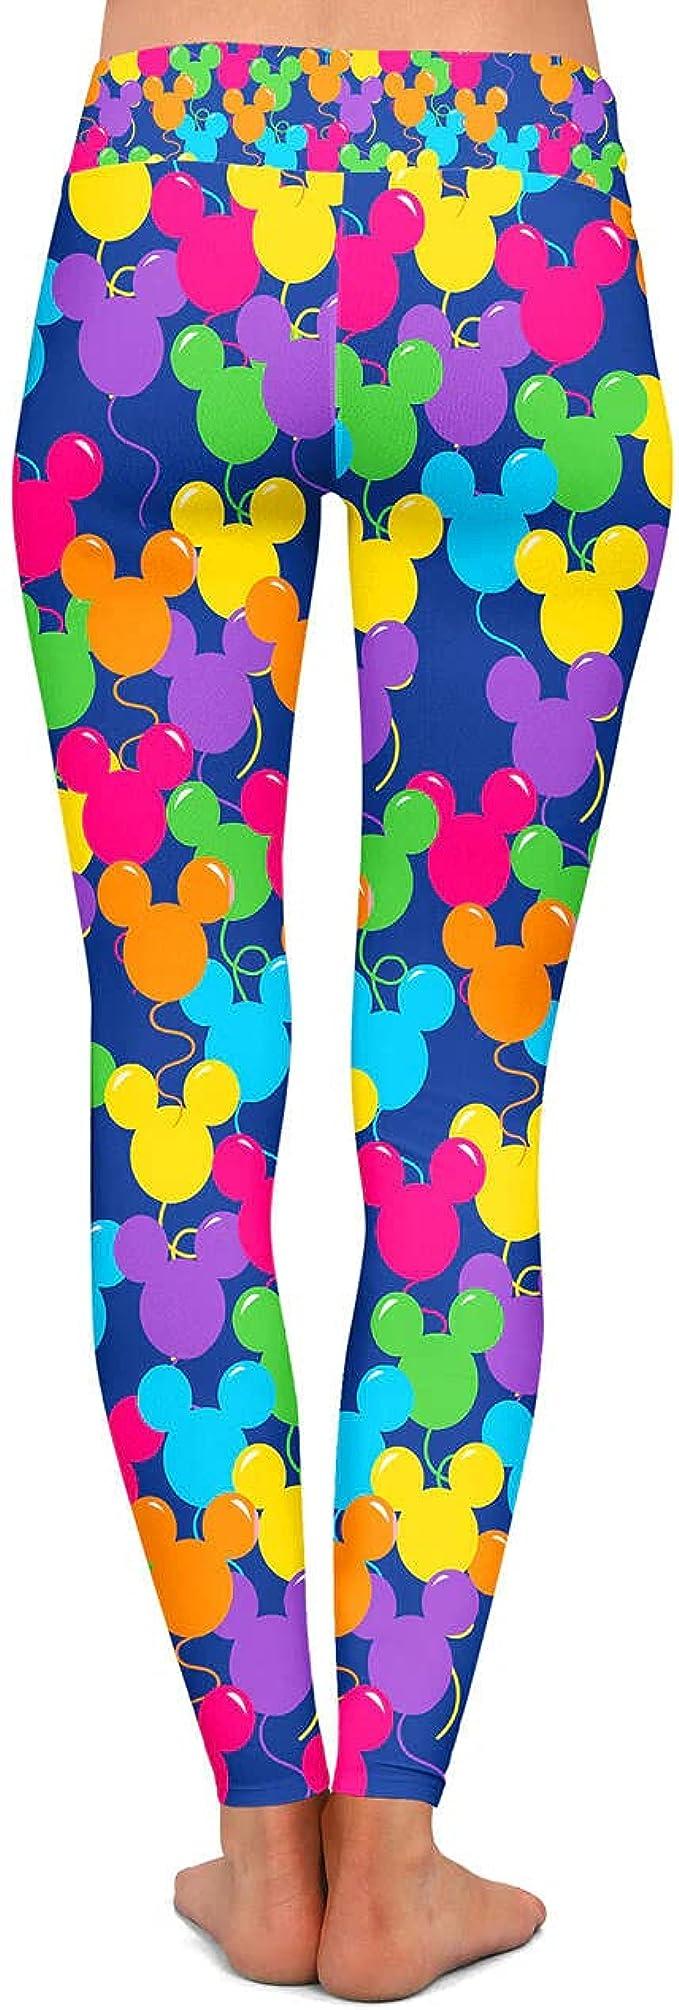 Mickey Mouse leggings toddler disney leggings baby disney ears Disney Inspired Rainbow Mickey Mouse Leggings mouse head leggings